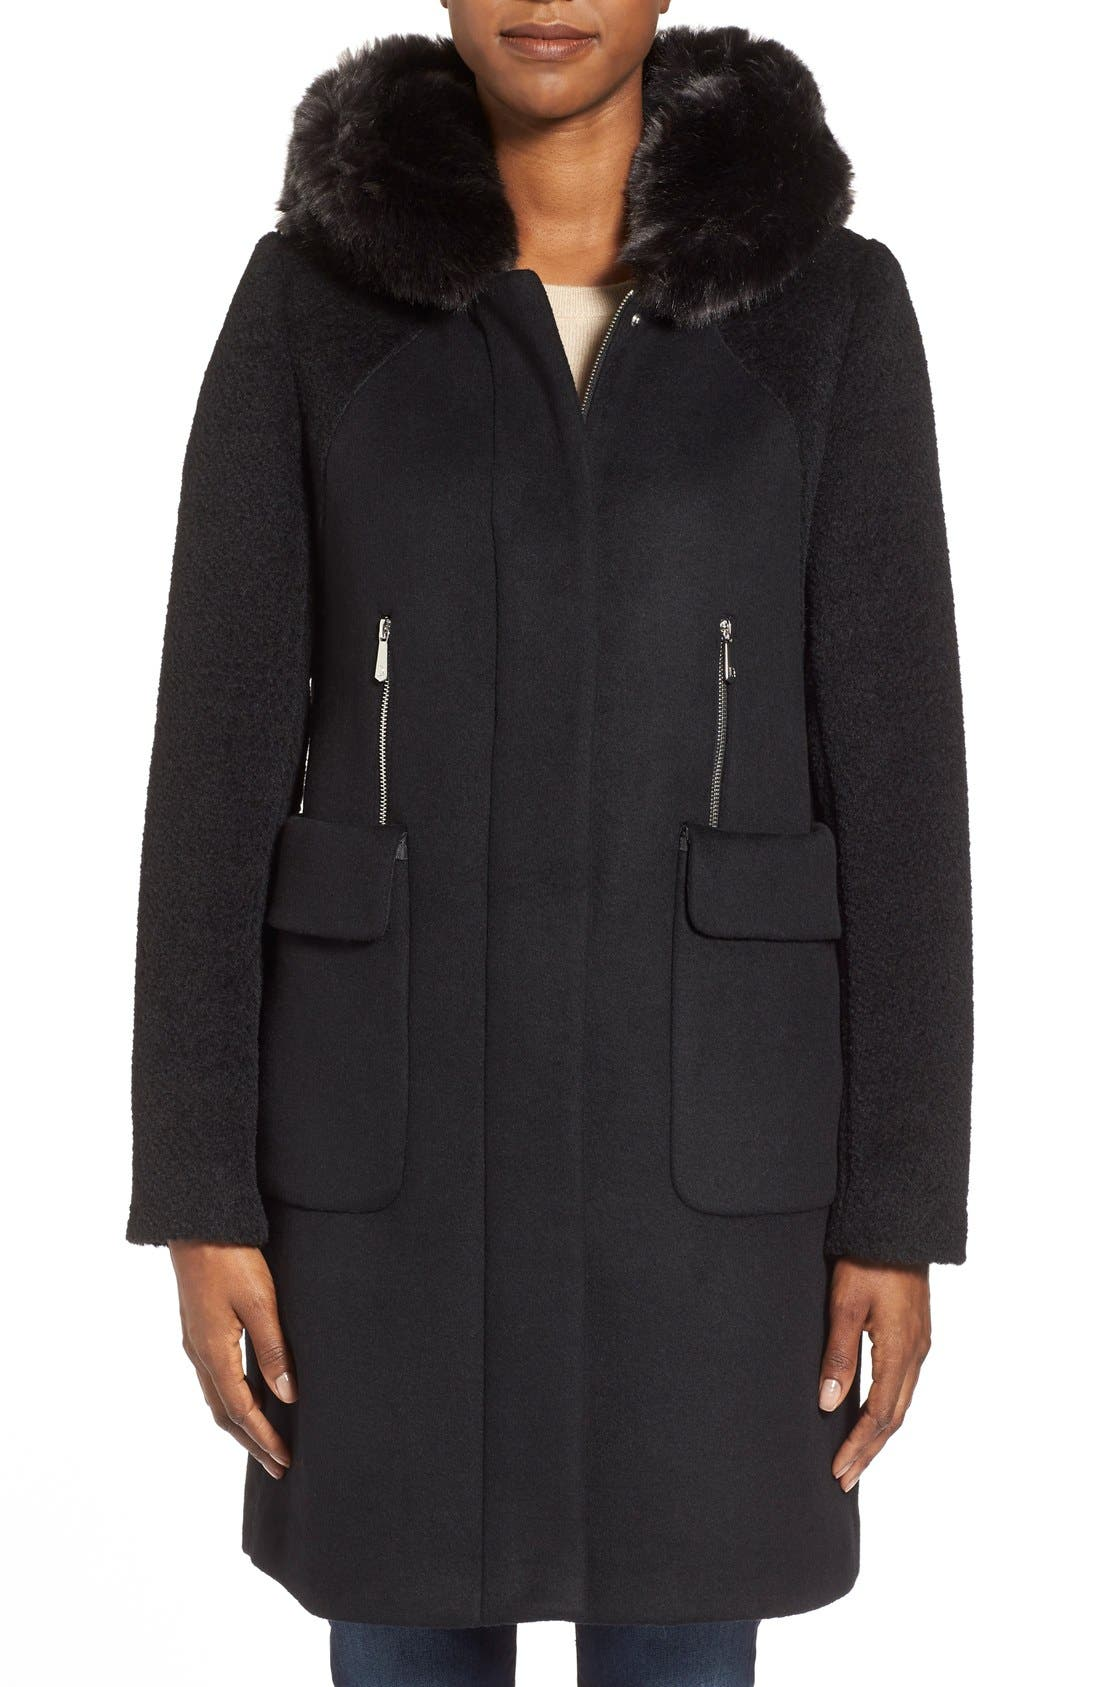 Main Image - Dawn Levy 'Lara' Mixed Media Wool Blend Coat withFauxFur Hood